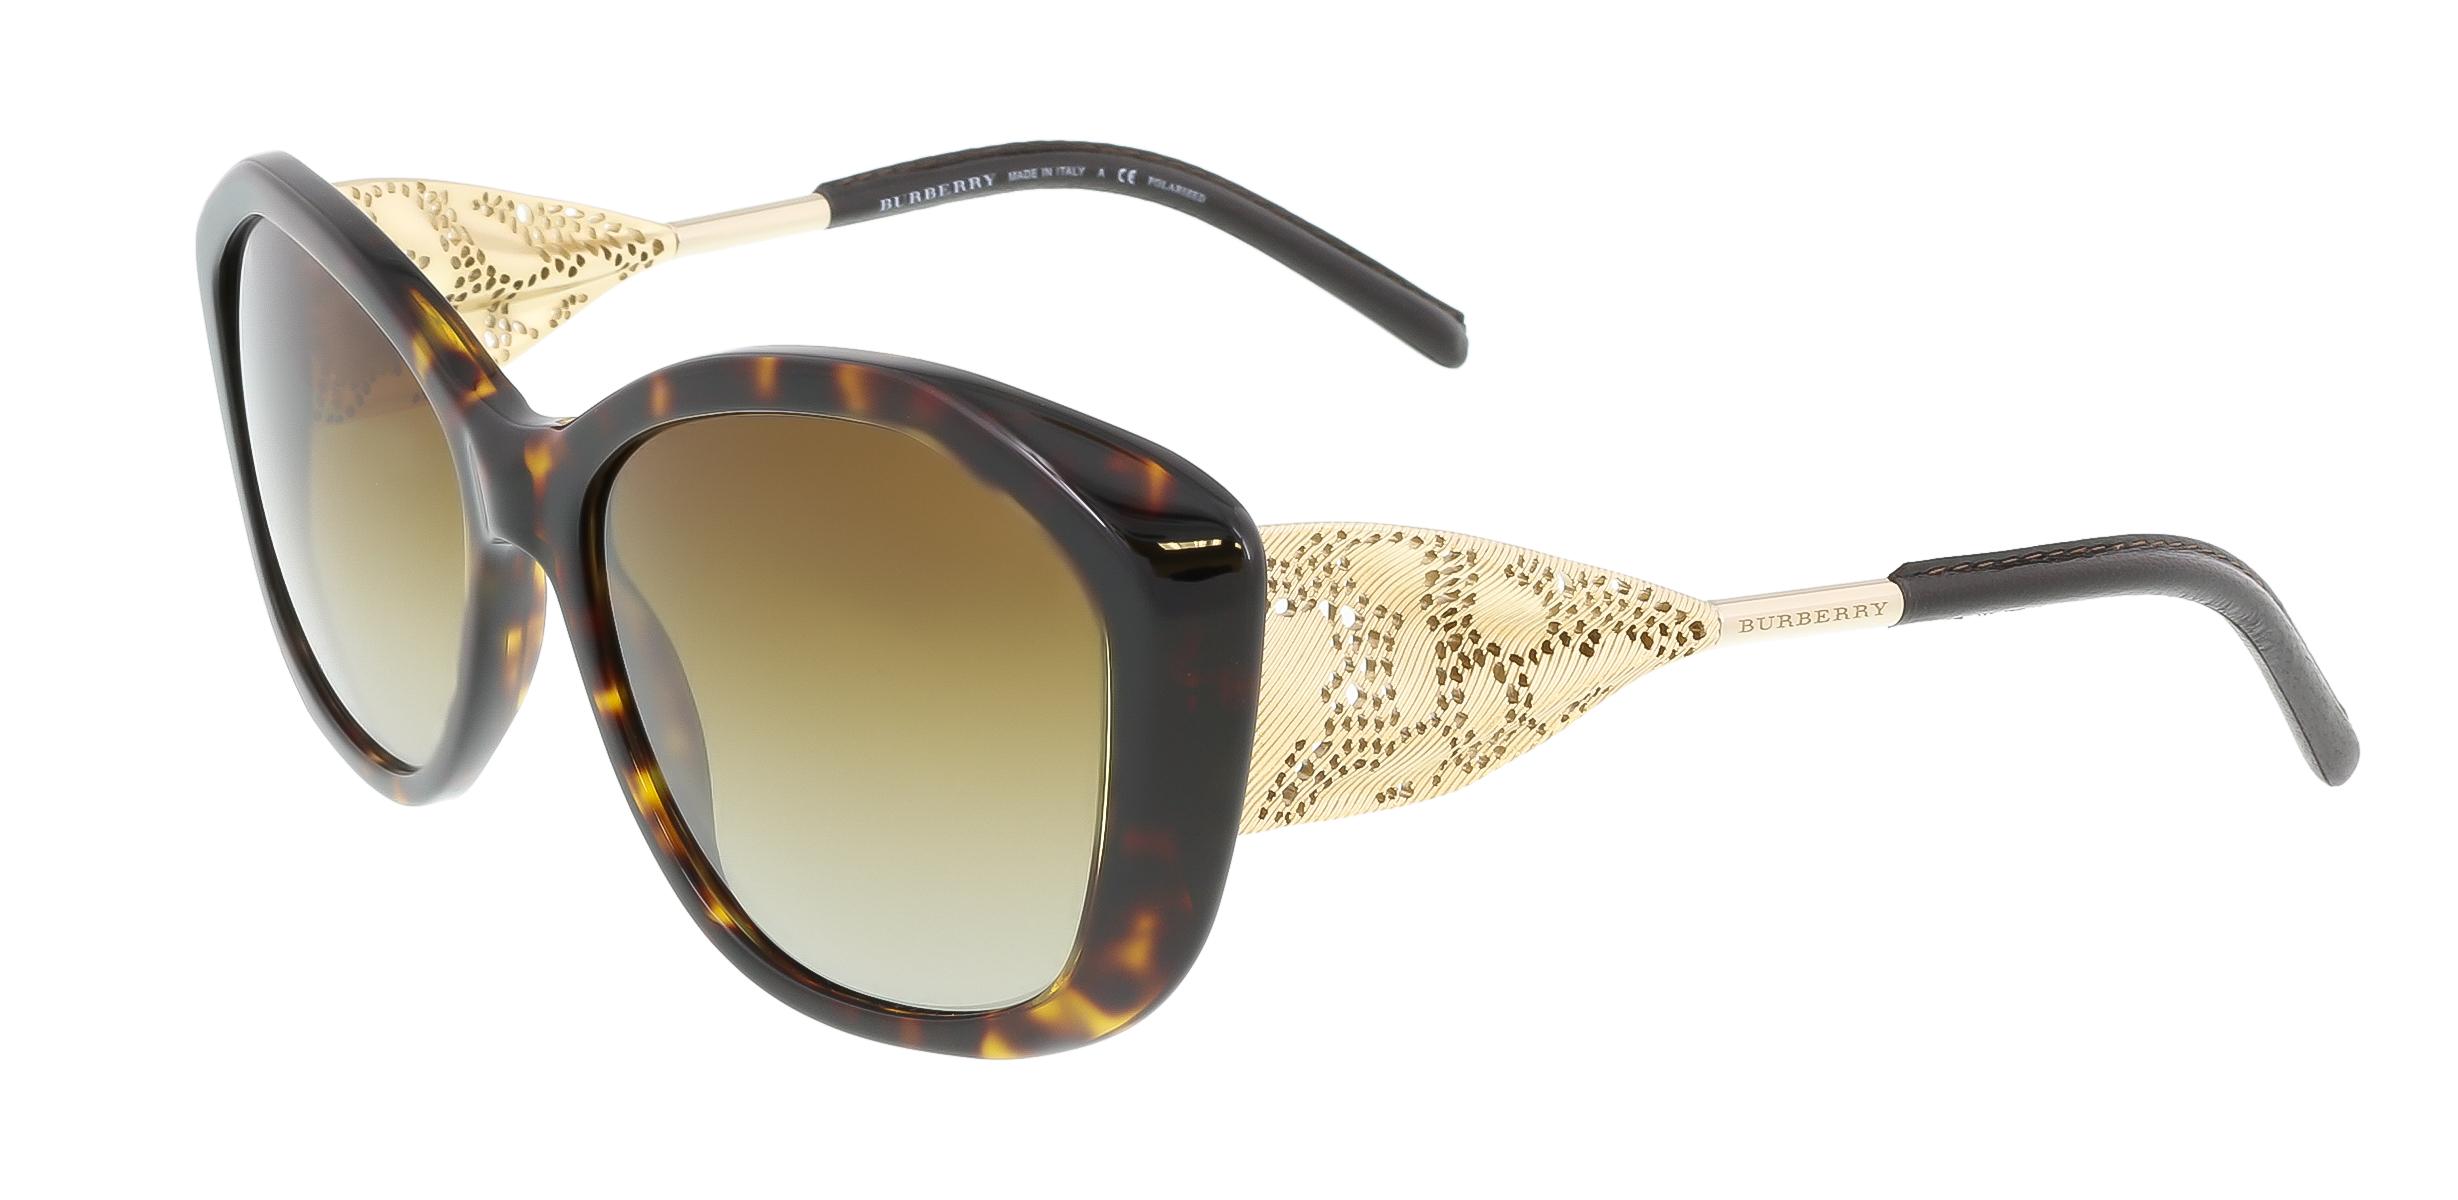 Burberry BE4208Q 3002T5 Dark Havana Oval Sunglasses